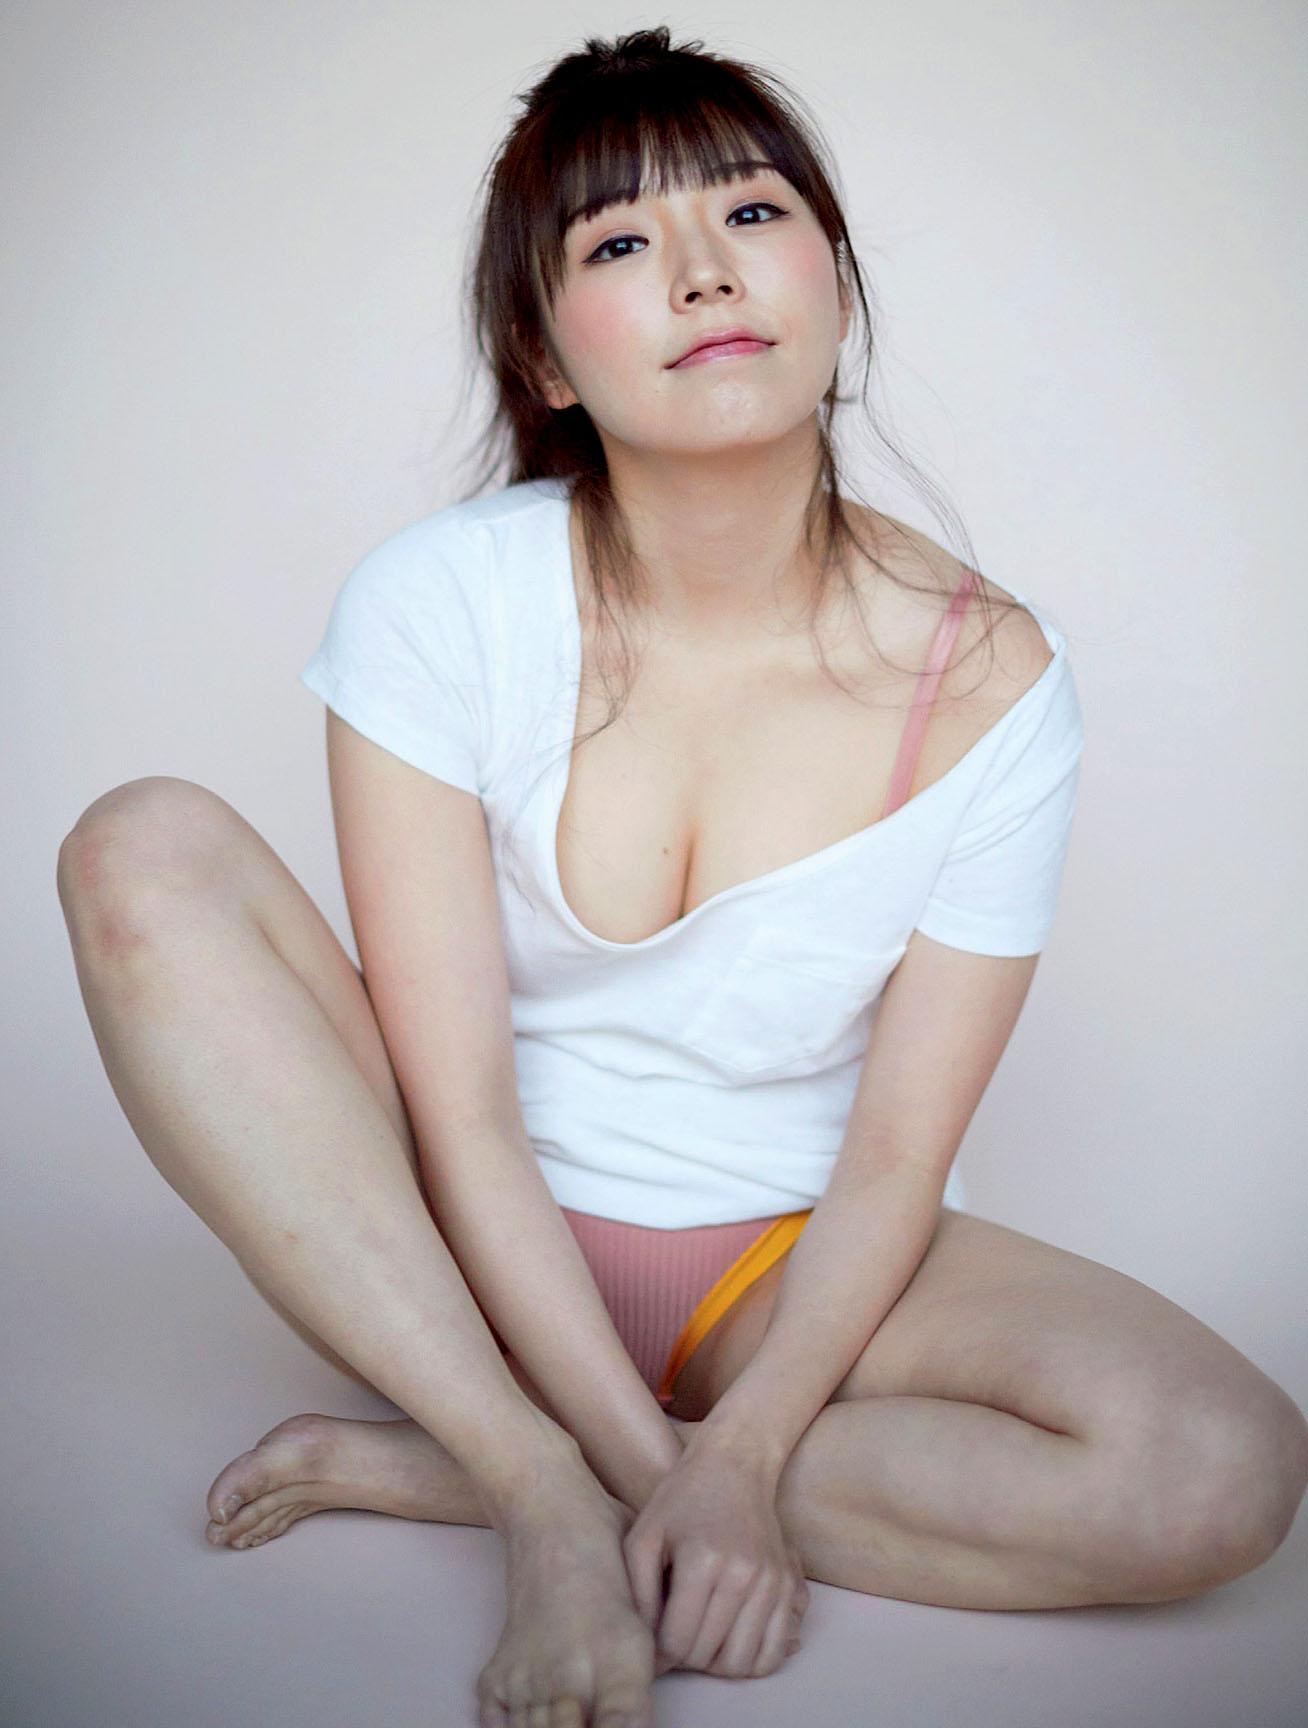 Natsuki Kawamura Flash 210302 03.jpg